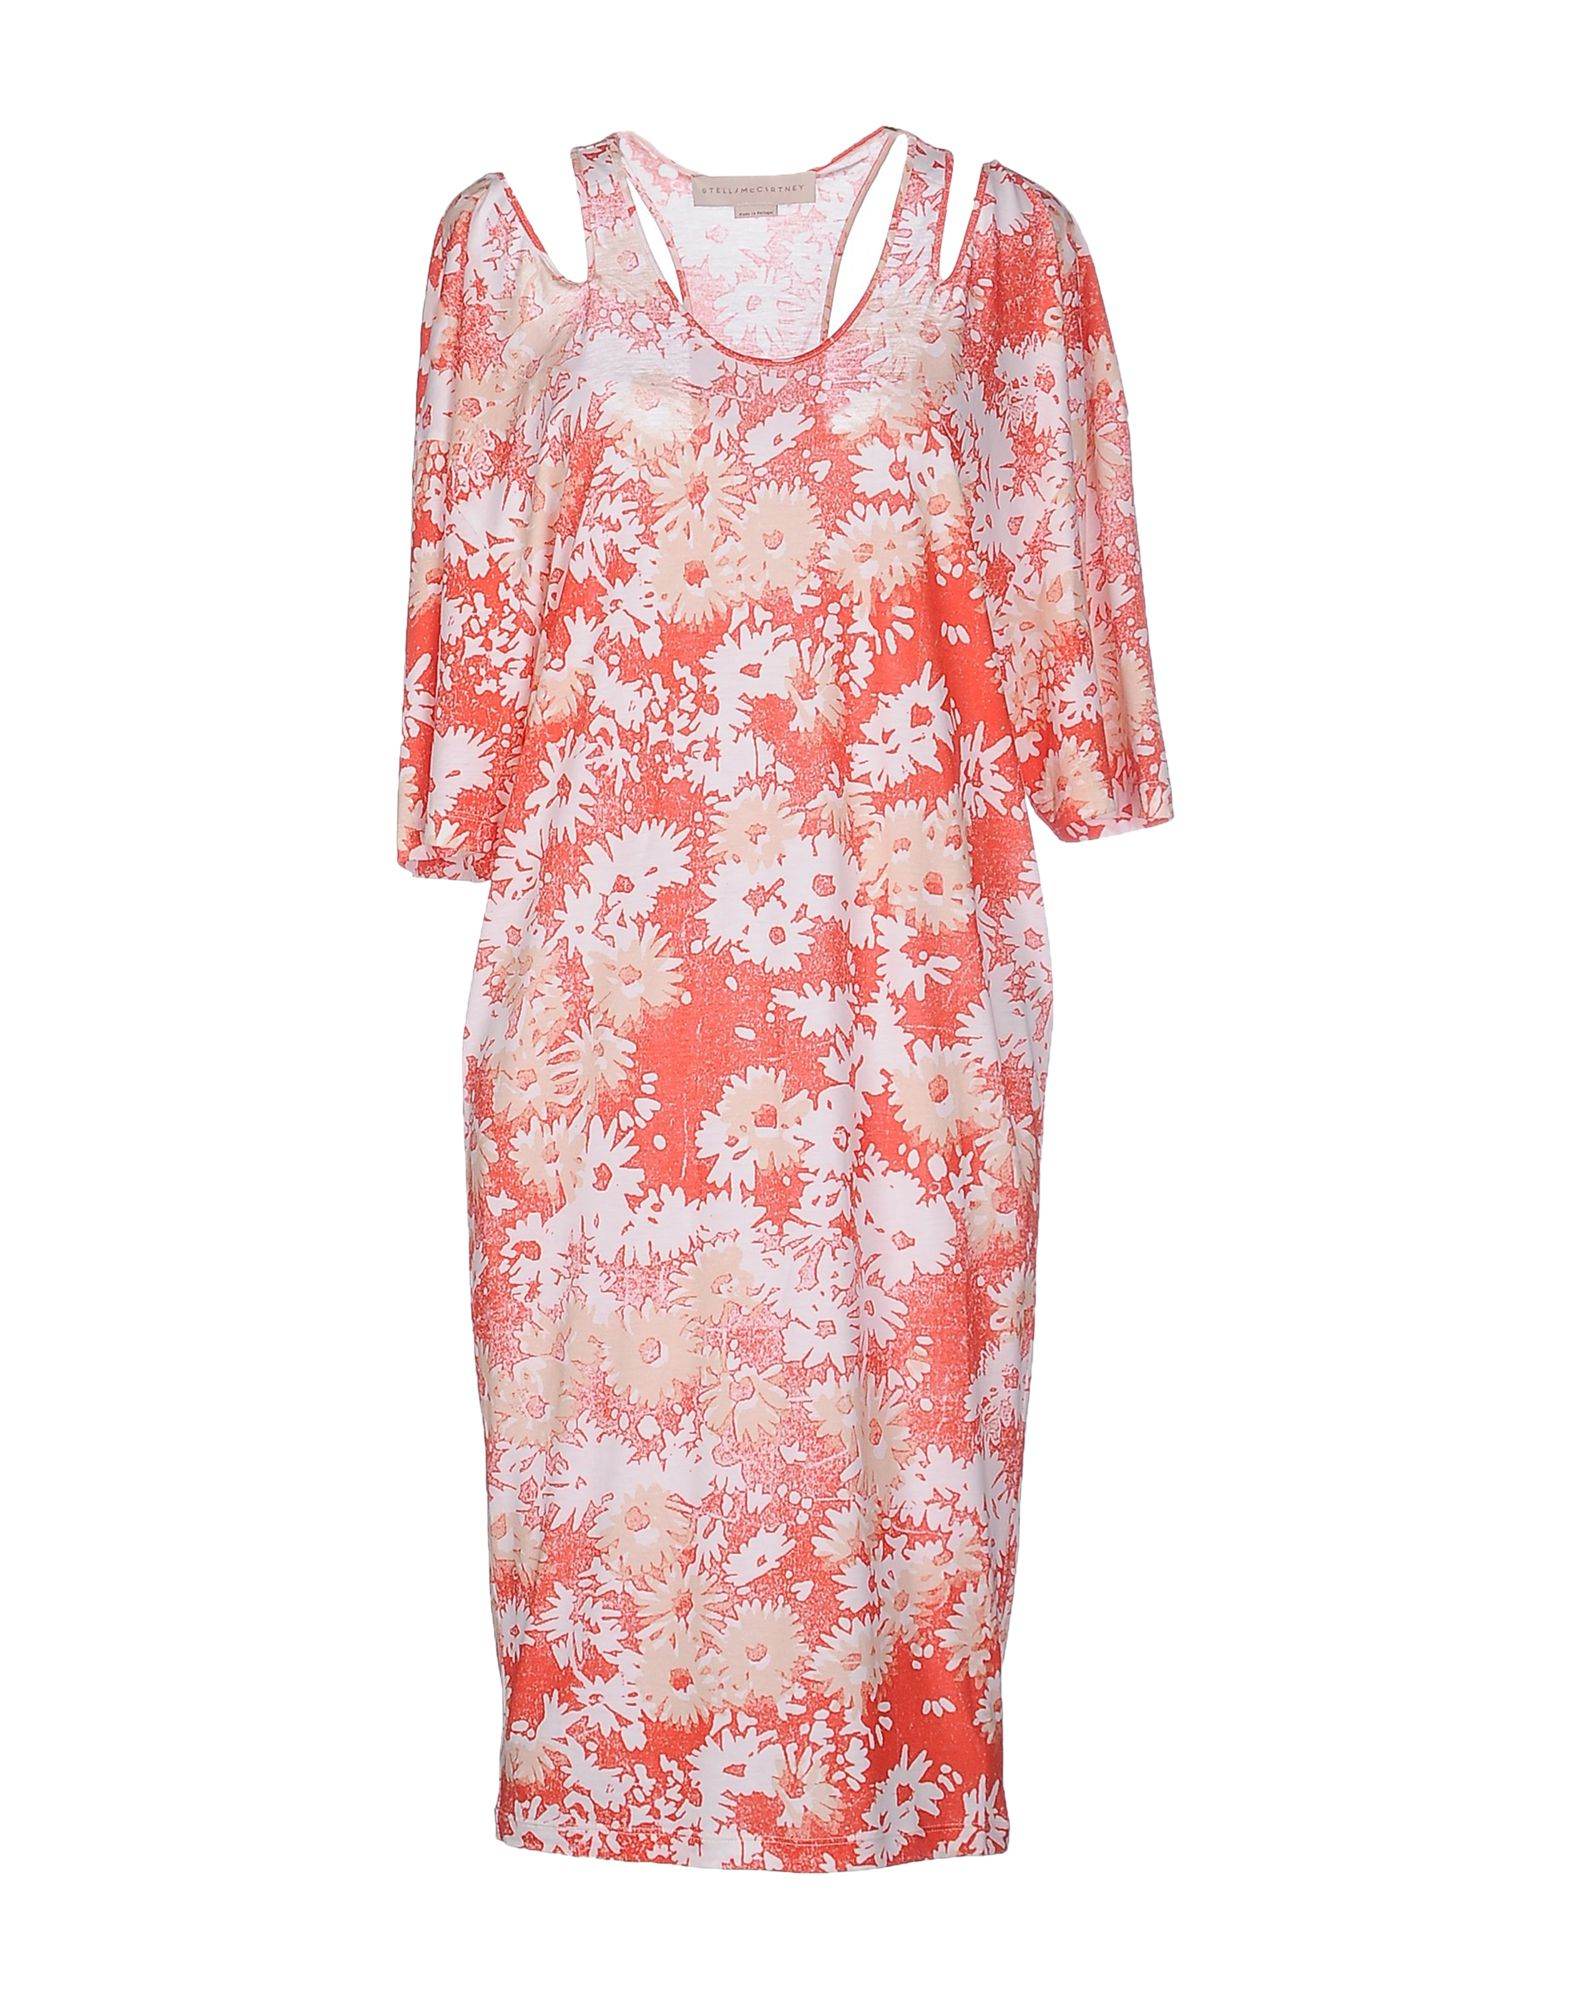 6b2c727f895 Doria Ragland Red Stella Mccartney Dresses